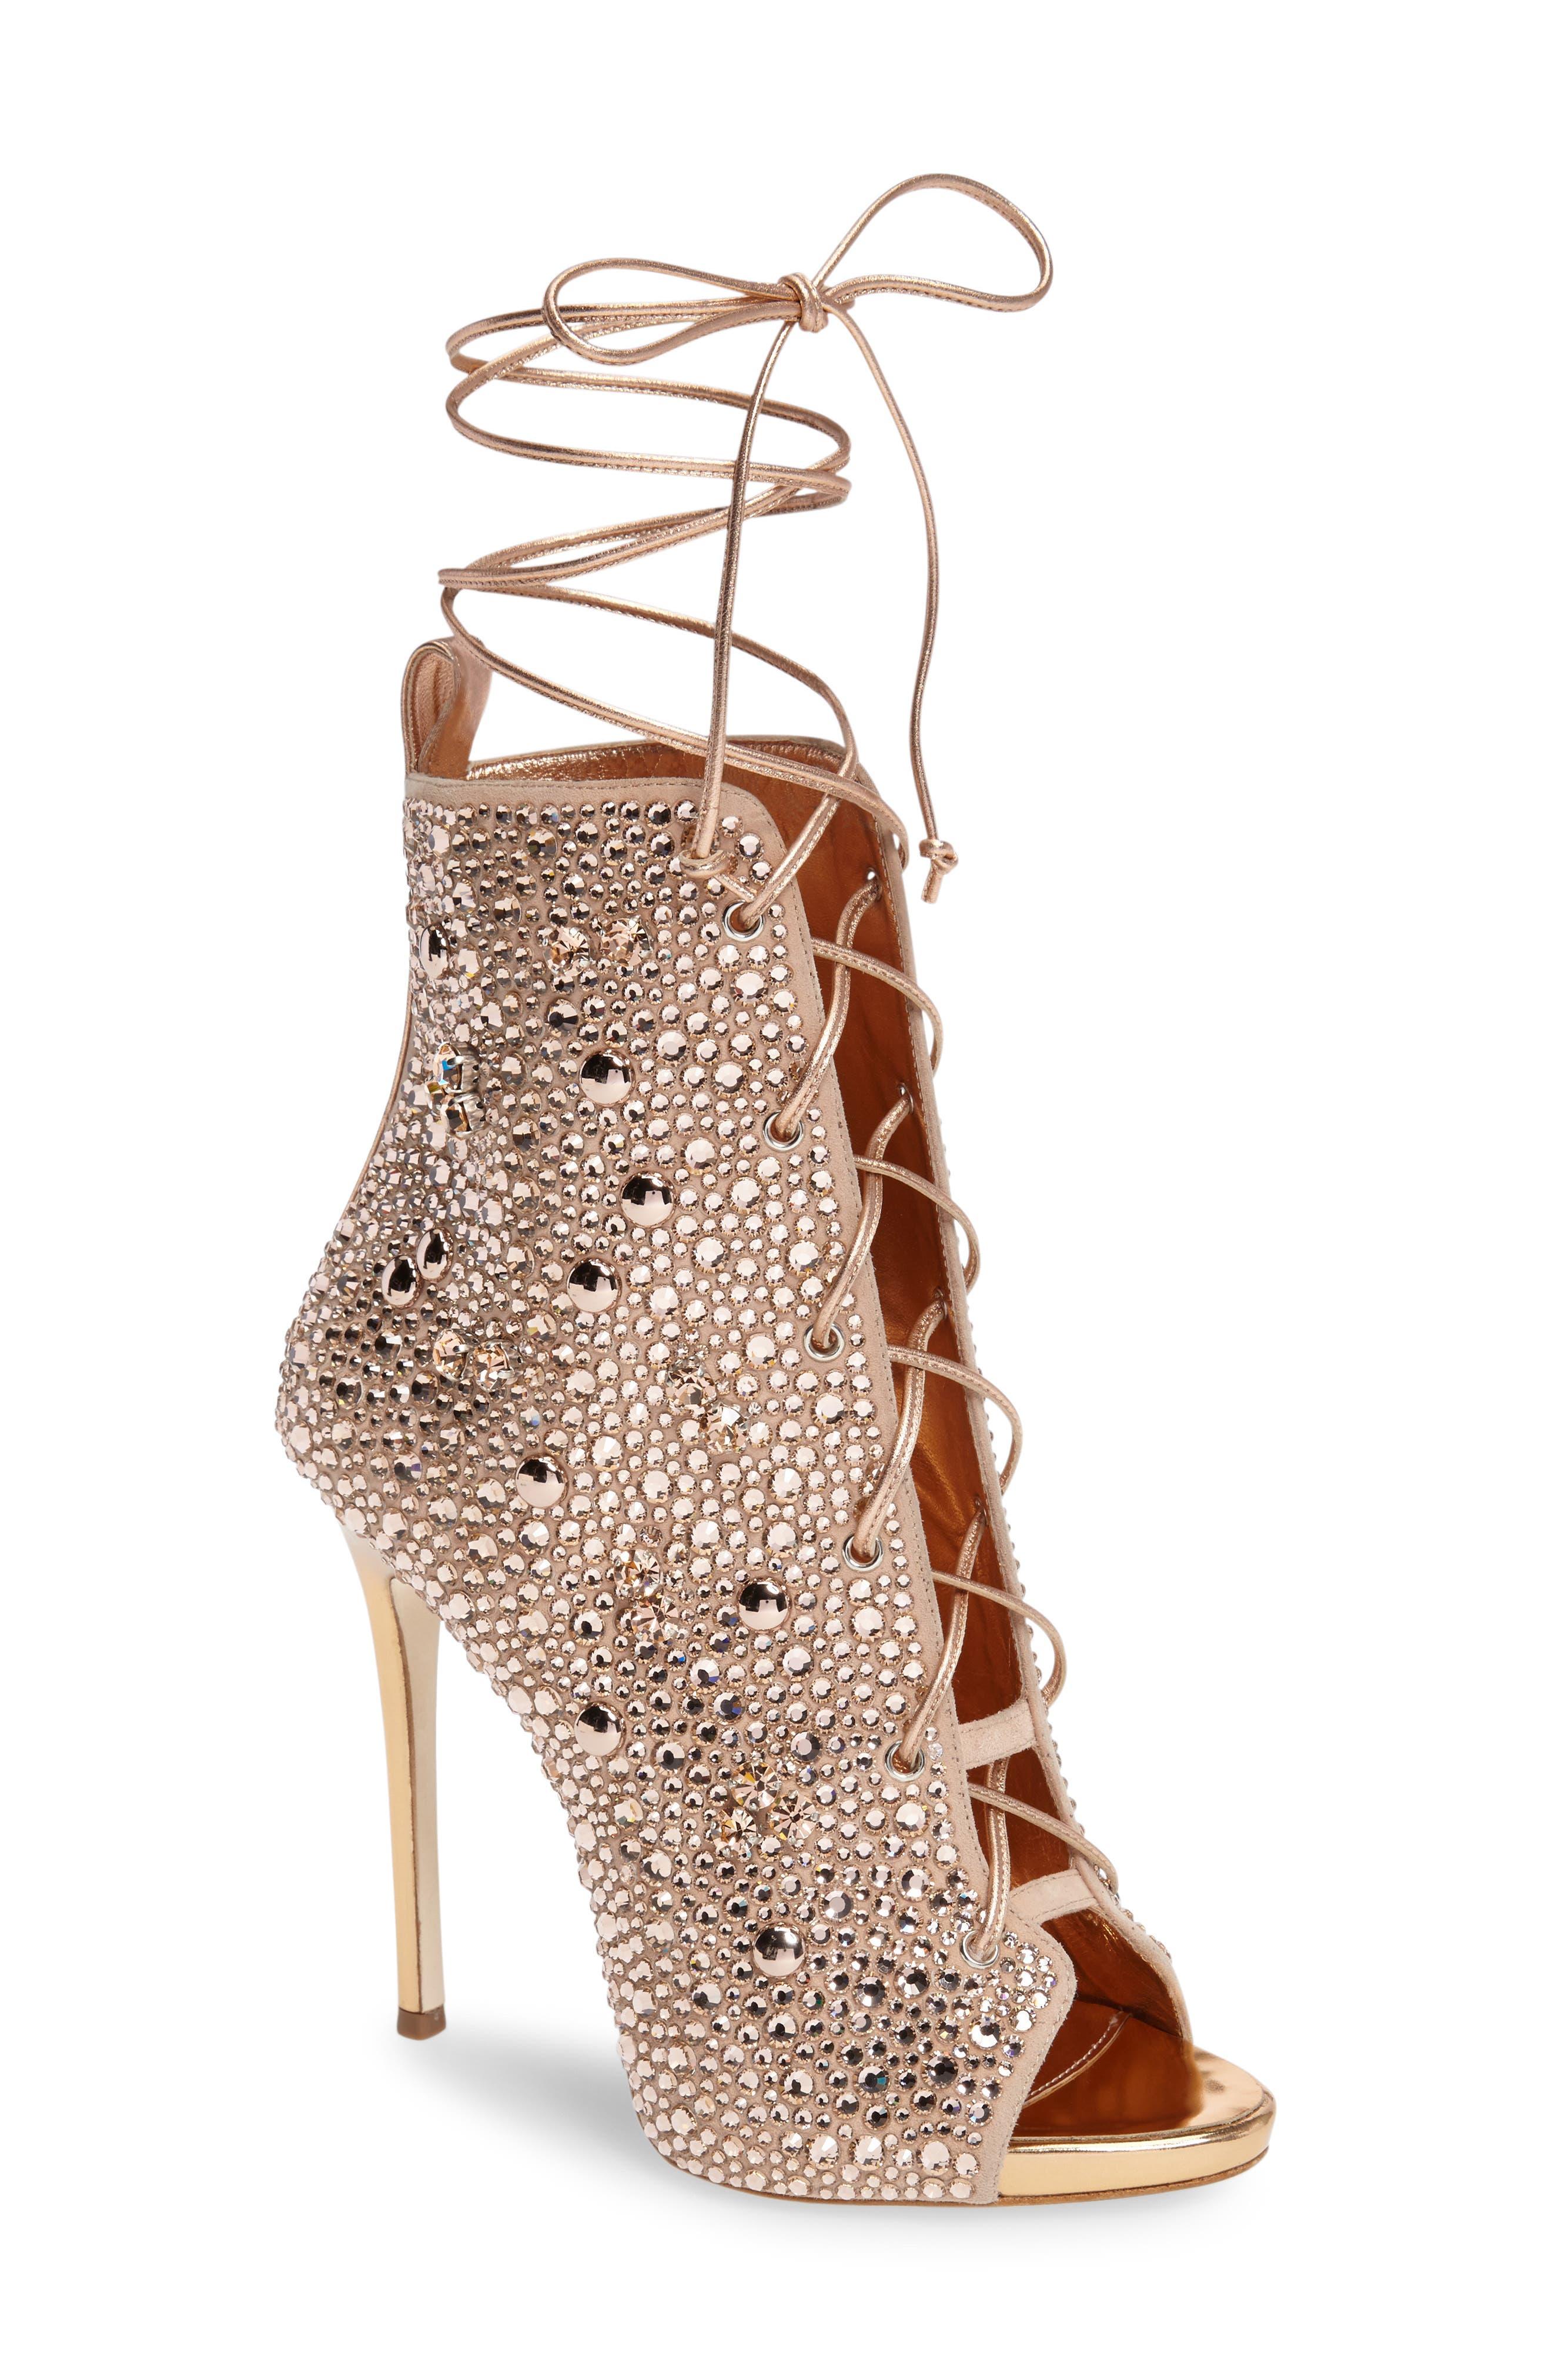 Giuseppe for Jennifer Lopez Lynda Embellished Lace-Up Sandal,                         Main,                         color, 710